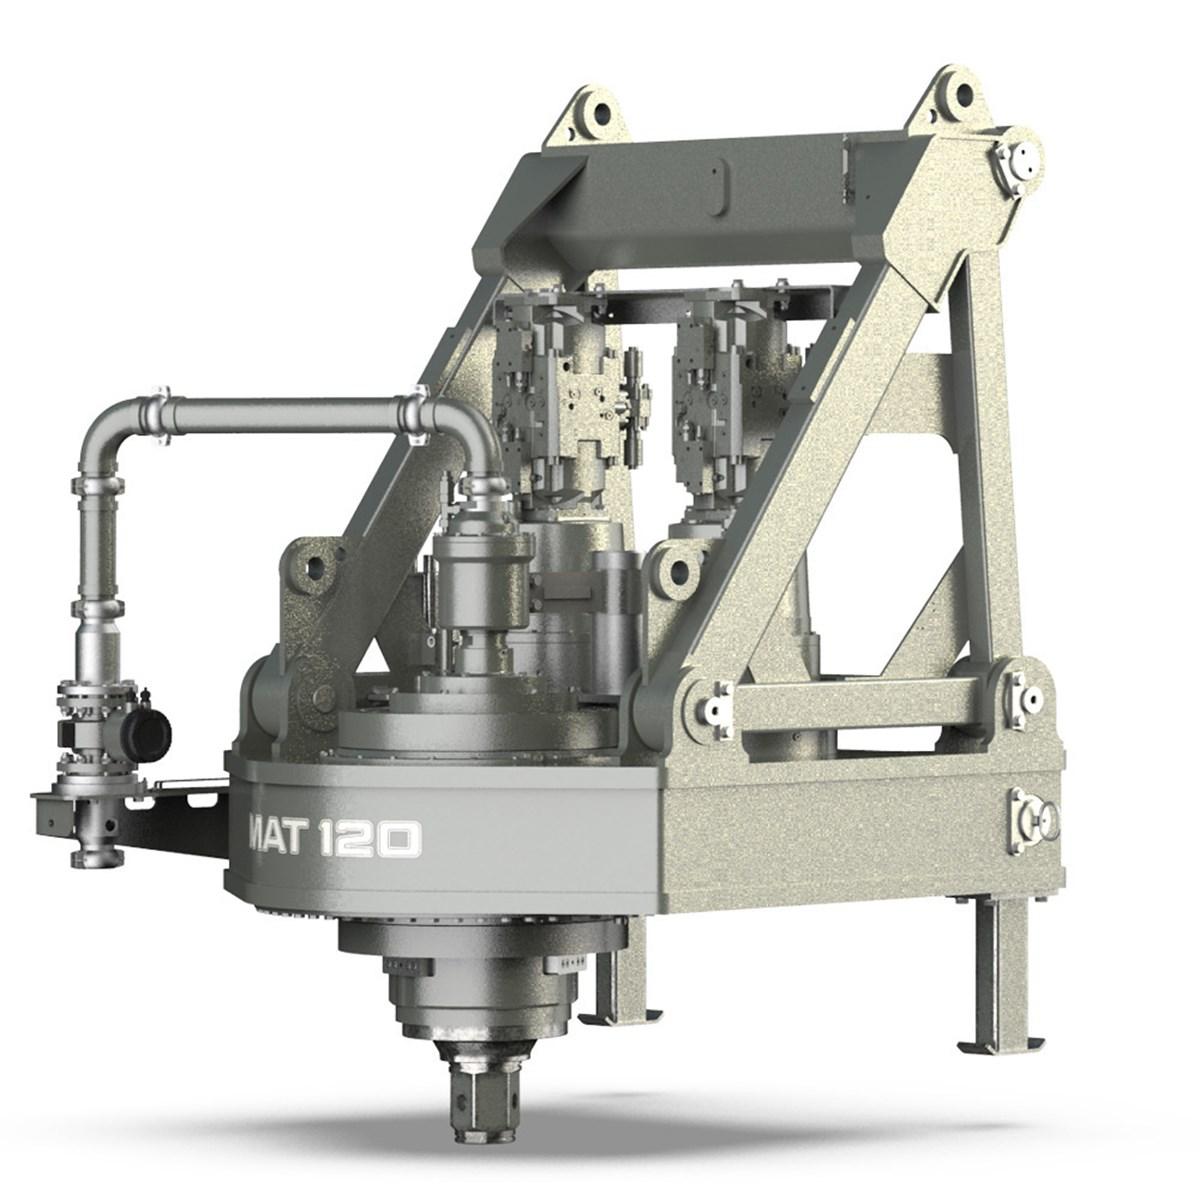 liebherr-mischantrieb-mixing-drive-mat-120.jpg